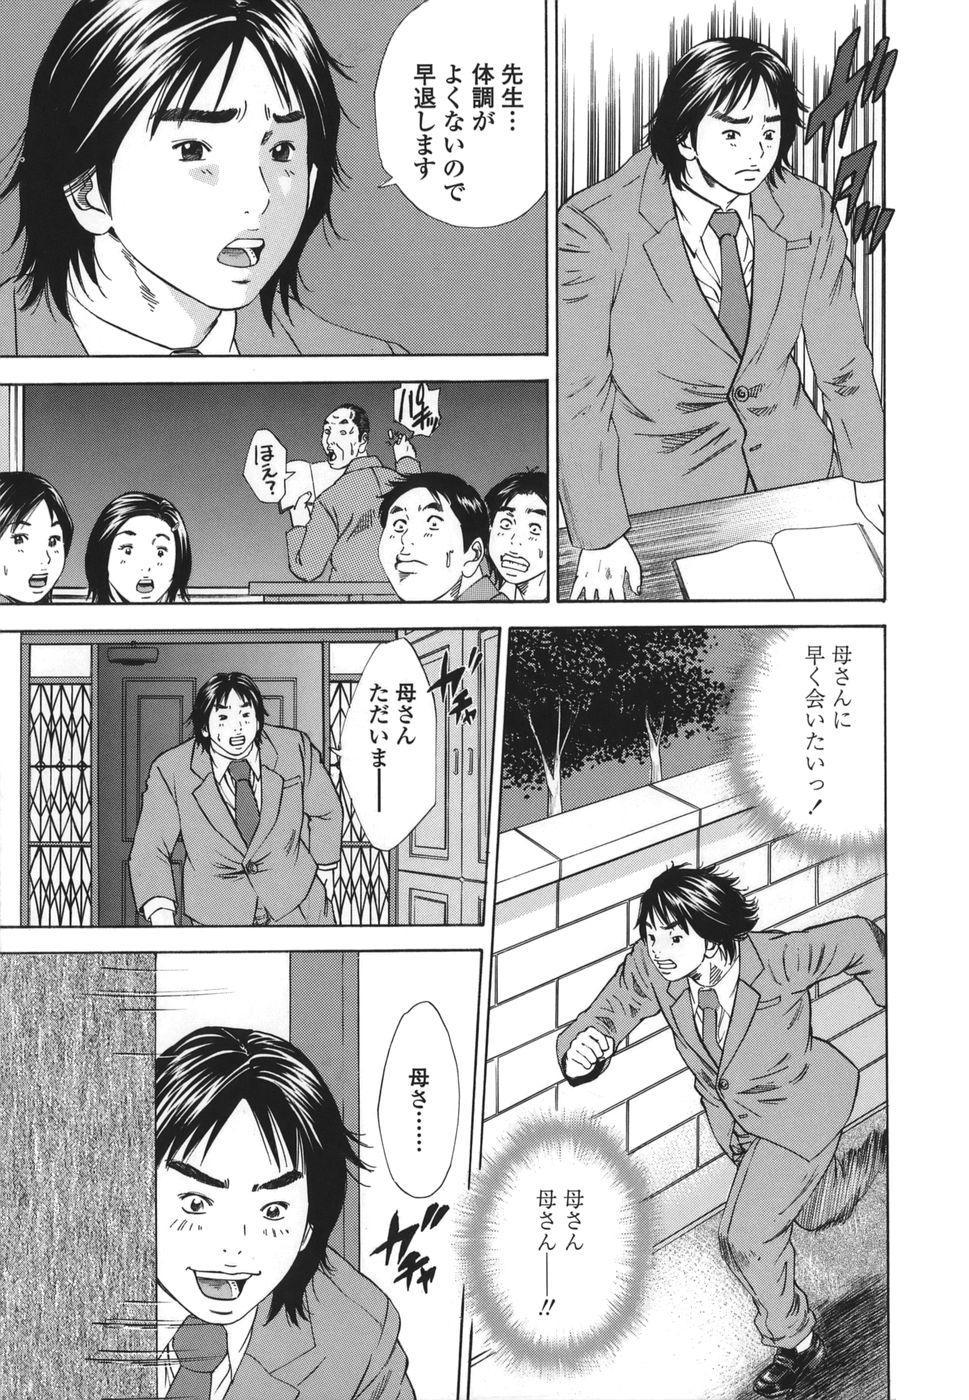 Kinshin Goukan - Near Relation Rapes 92